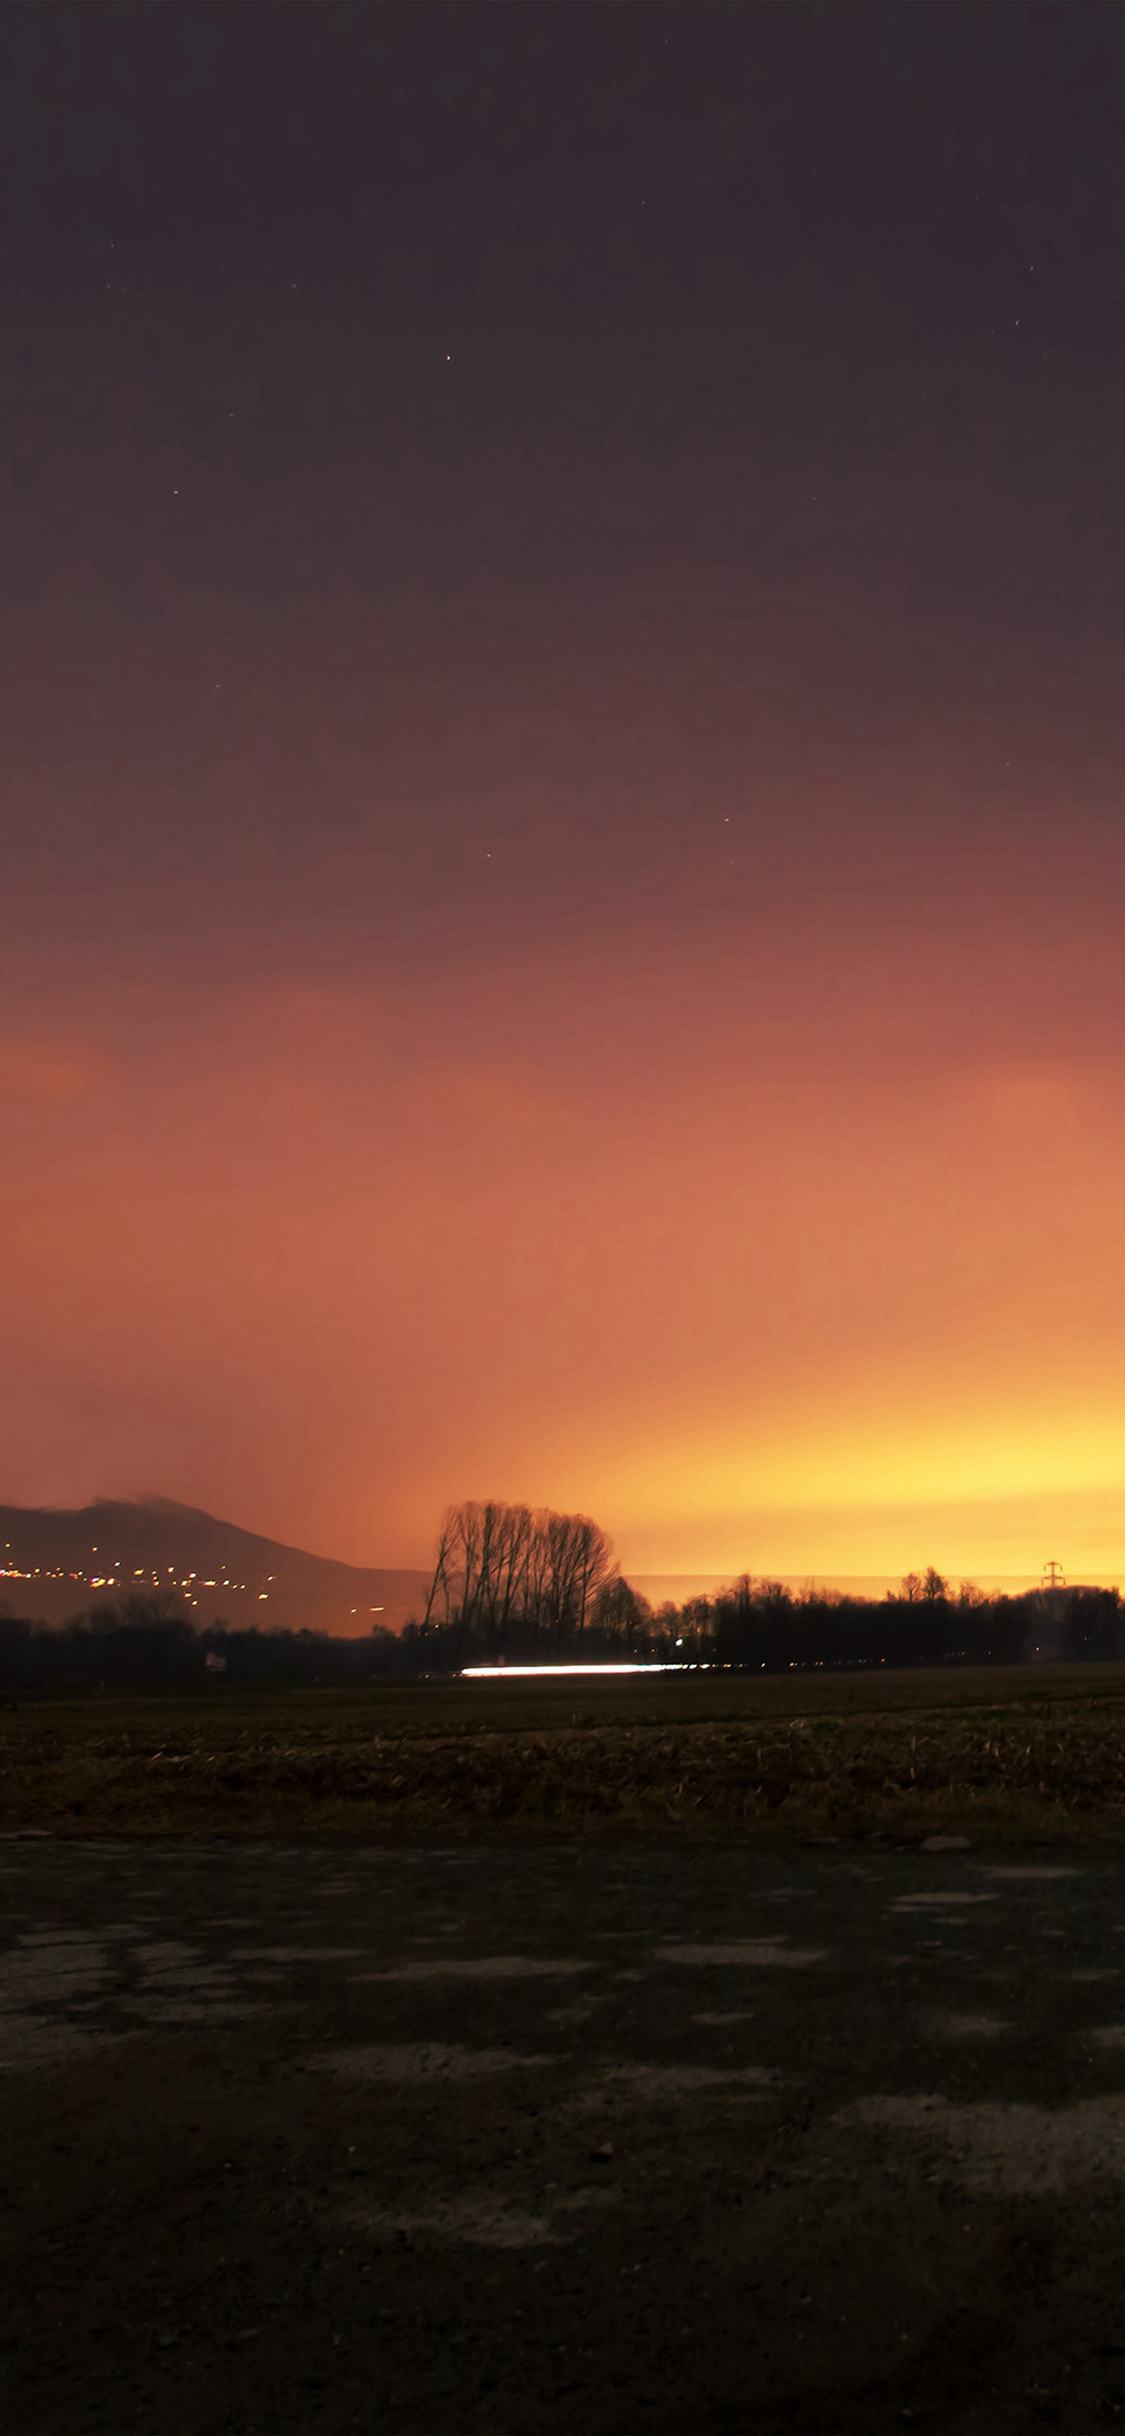 Lock Screen Wallpaper Iphone 7 Dawn Nature Sky Sunset Mountain Red Dark Iphone X